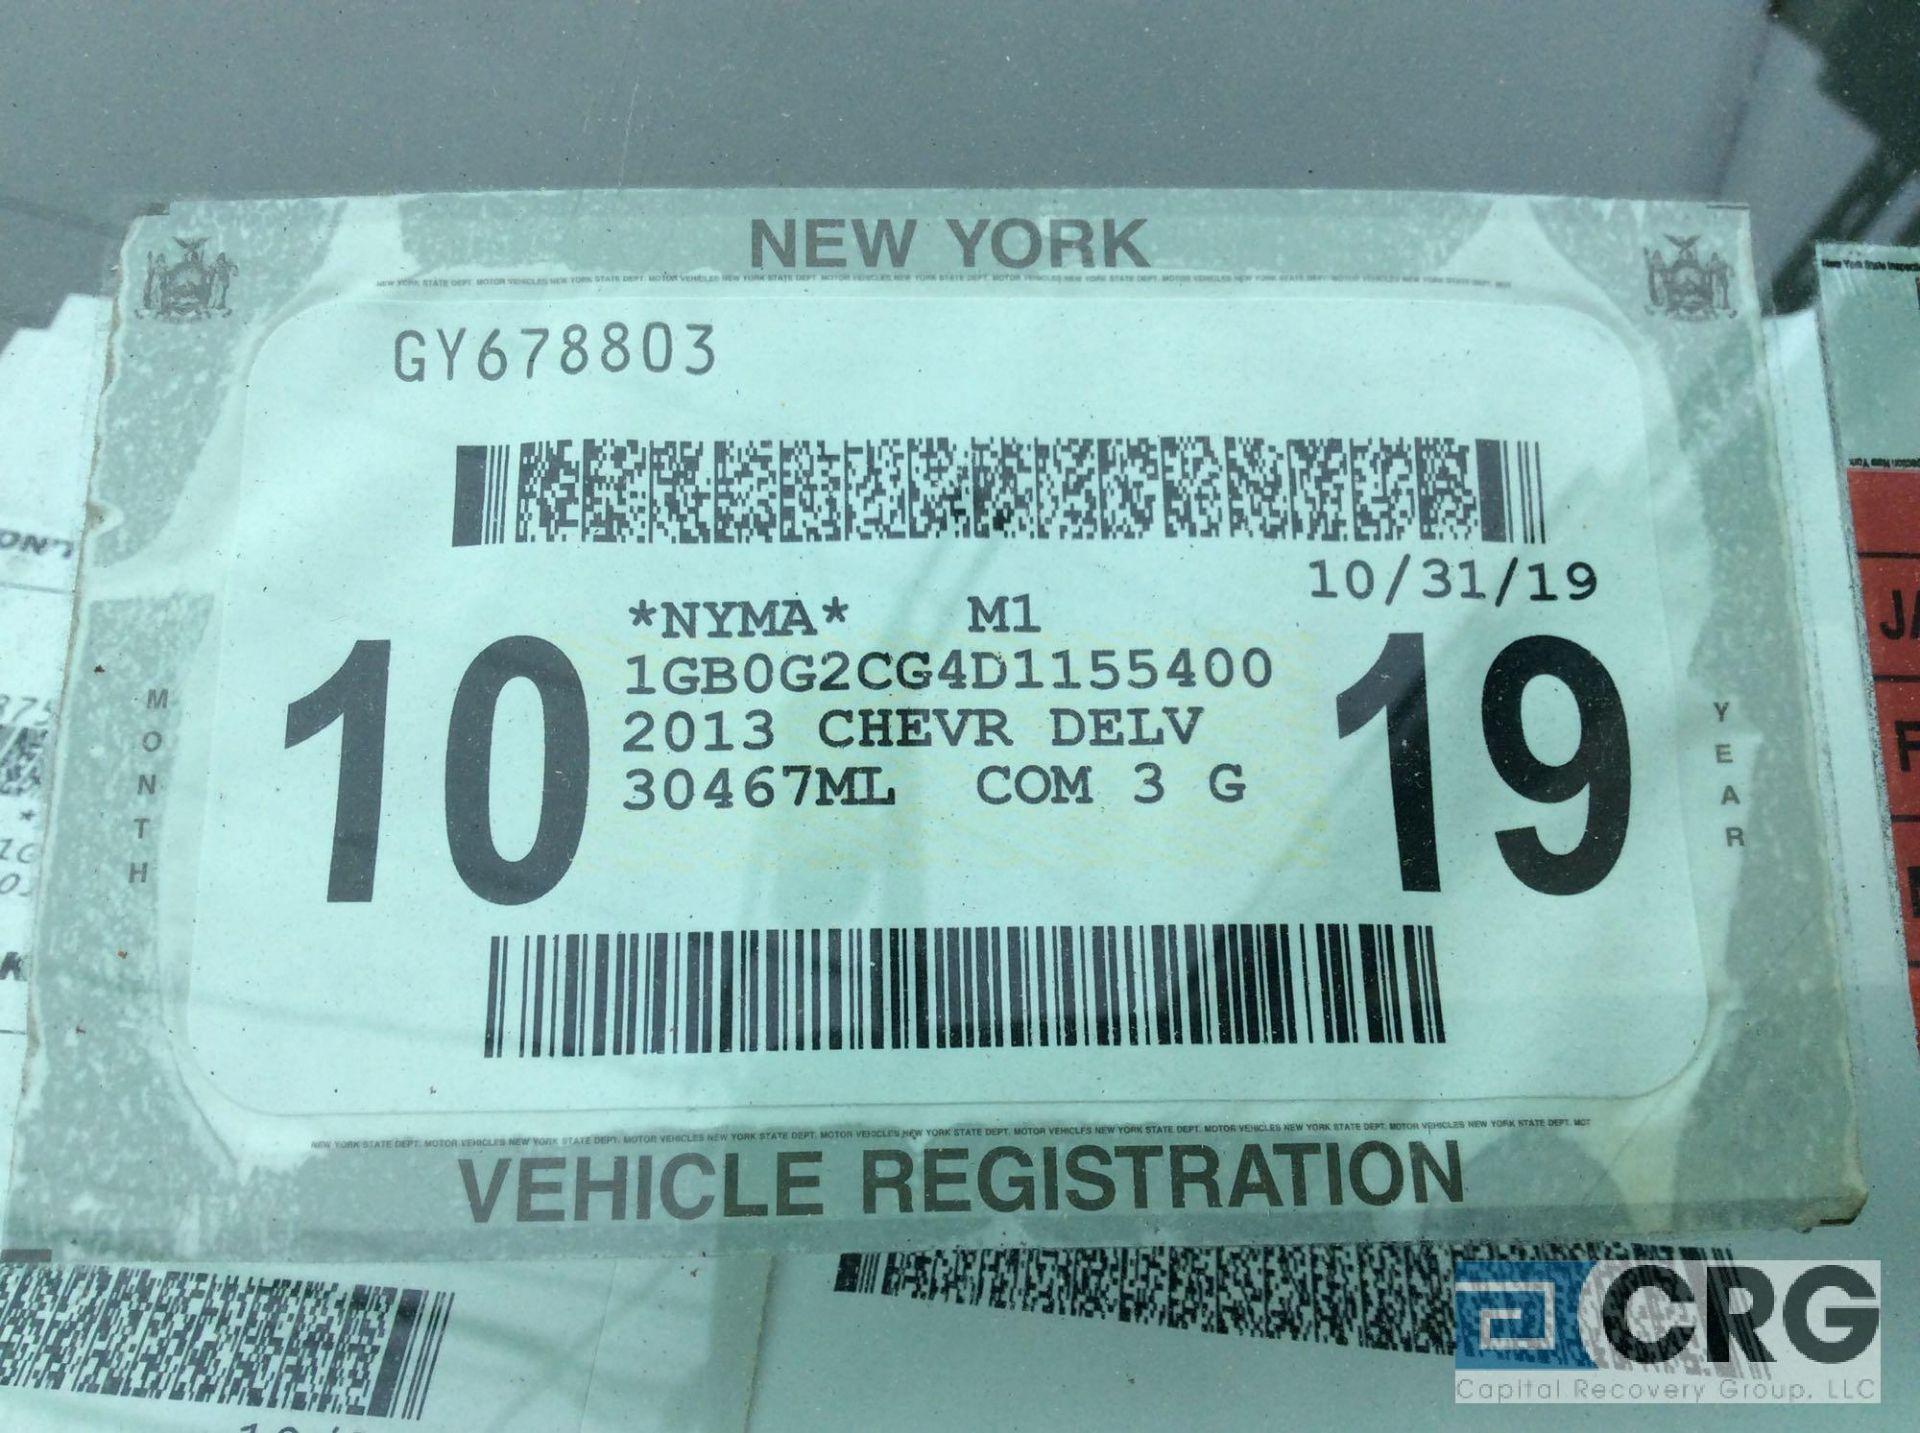 Lot 336 - 2013 Chevy Express 3500 14 foot box truck, VIN# 1GB0G2CG4D1155400, 98,605 miles